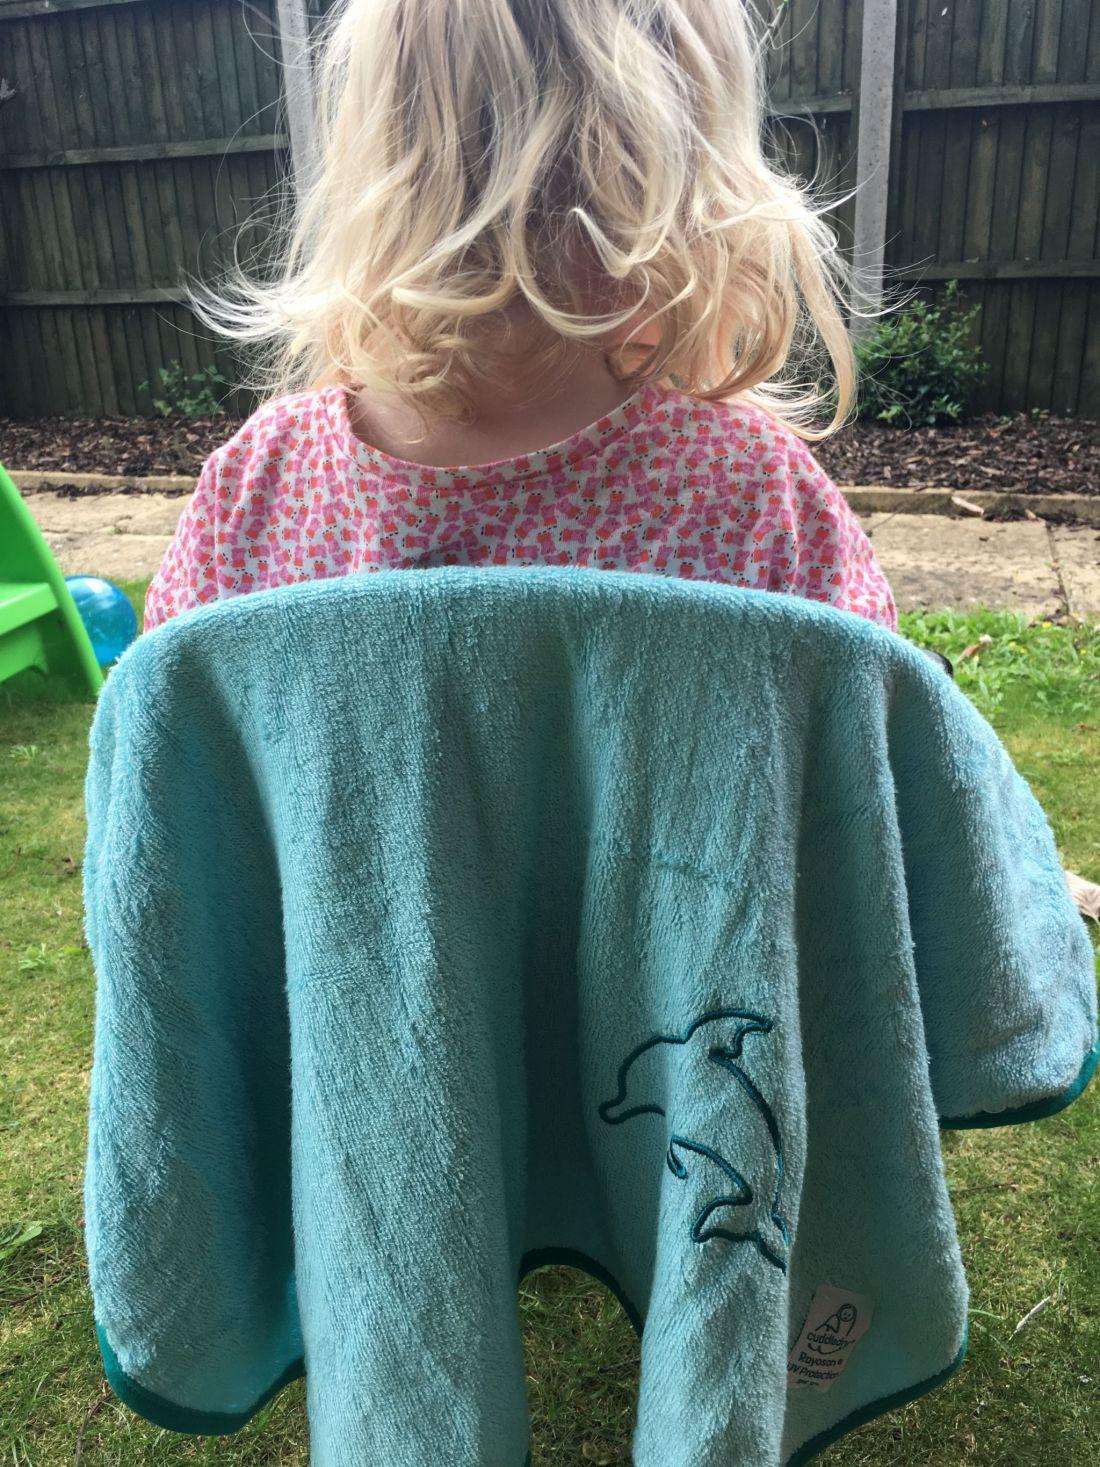 Cuddledry SPF50 poncho towel in aqua/turquoise